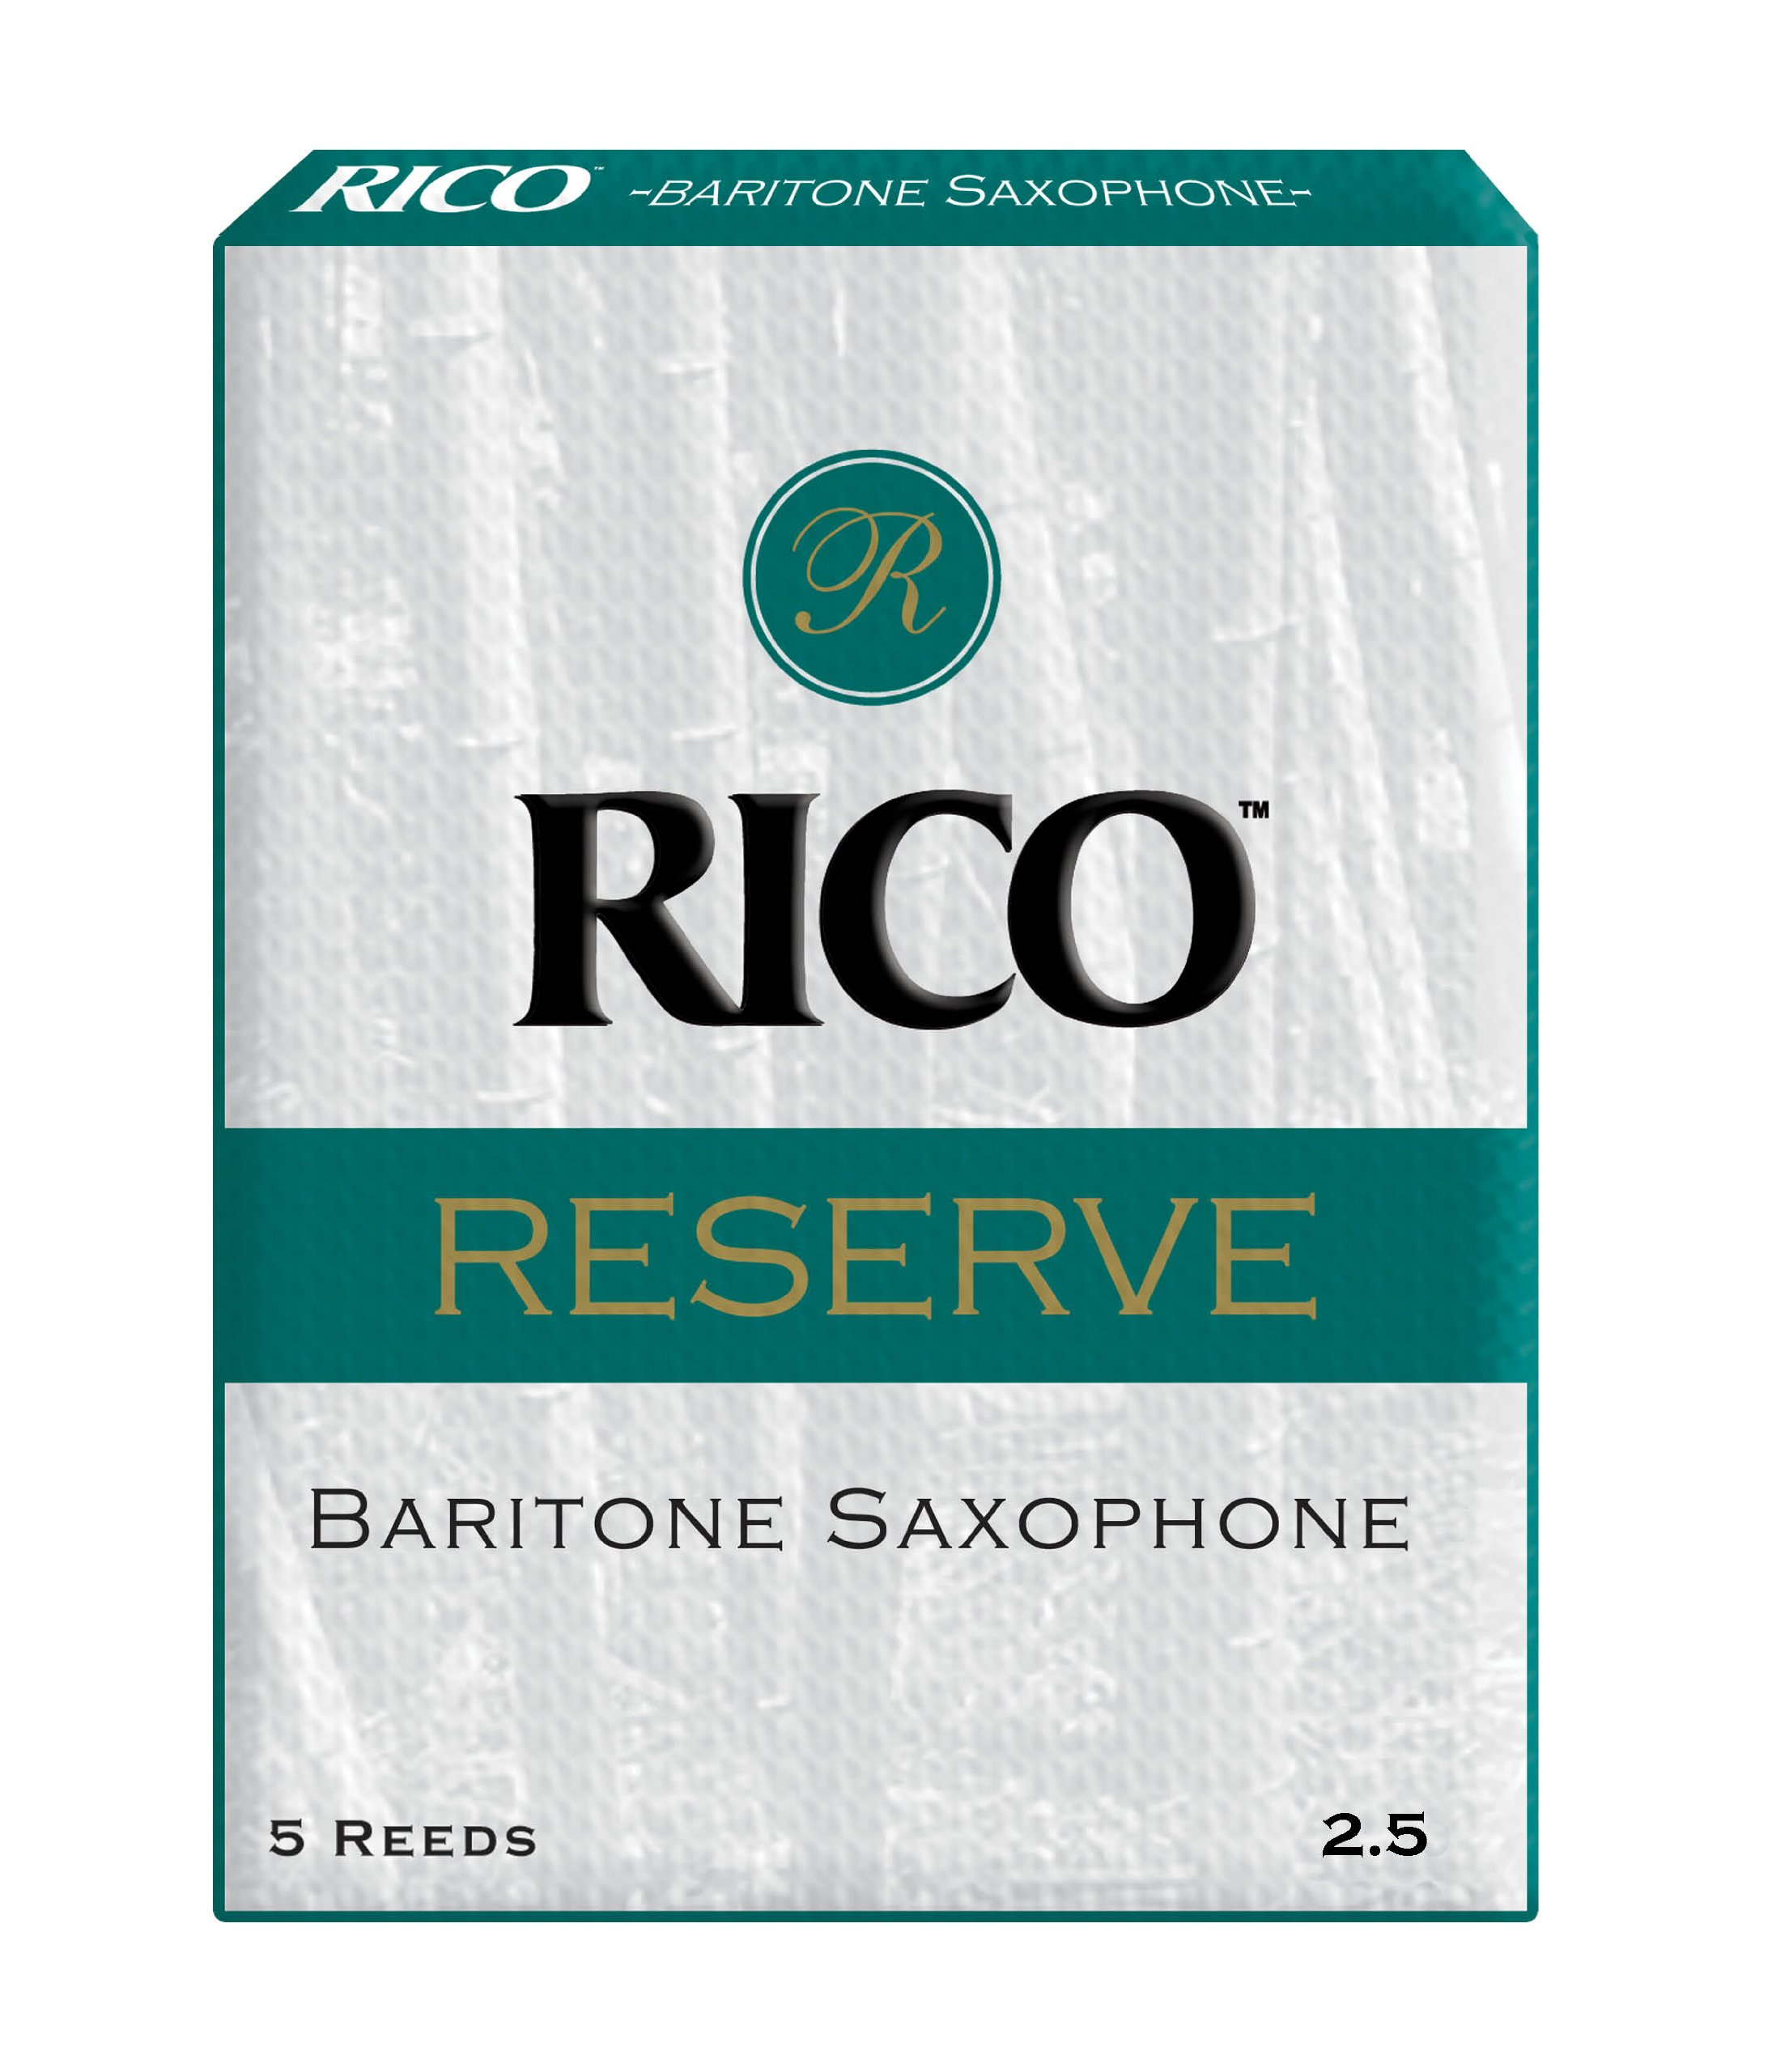 Rico Reserve Baritone Sax Reeds, Strength 2.5, 5-pack